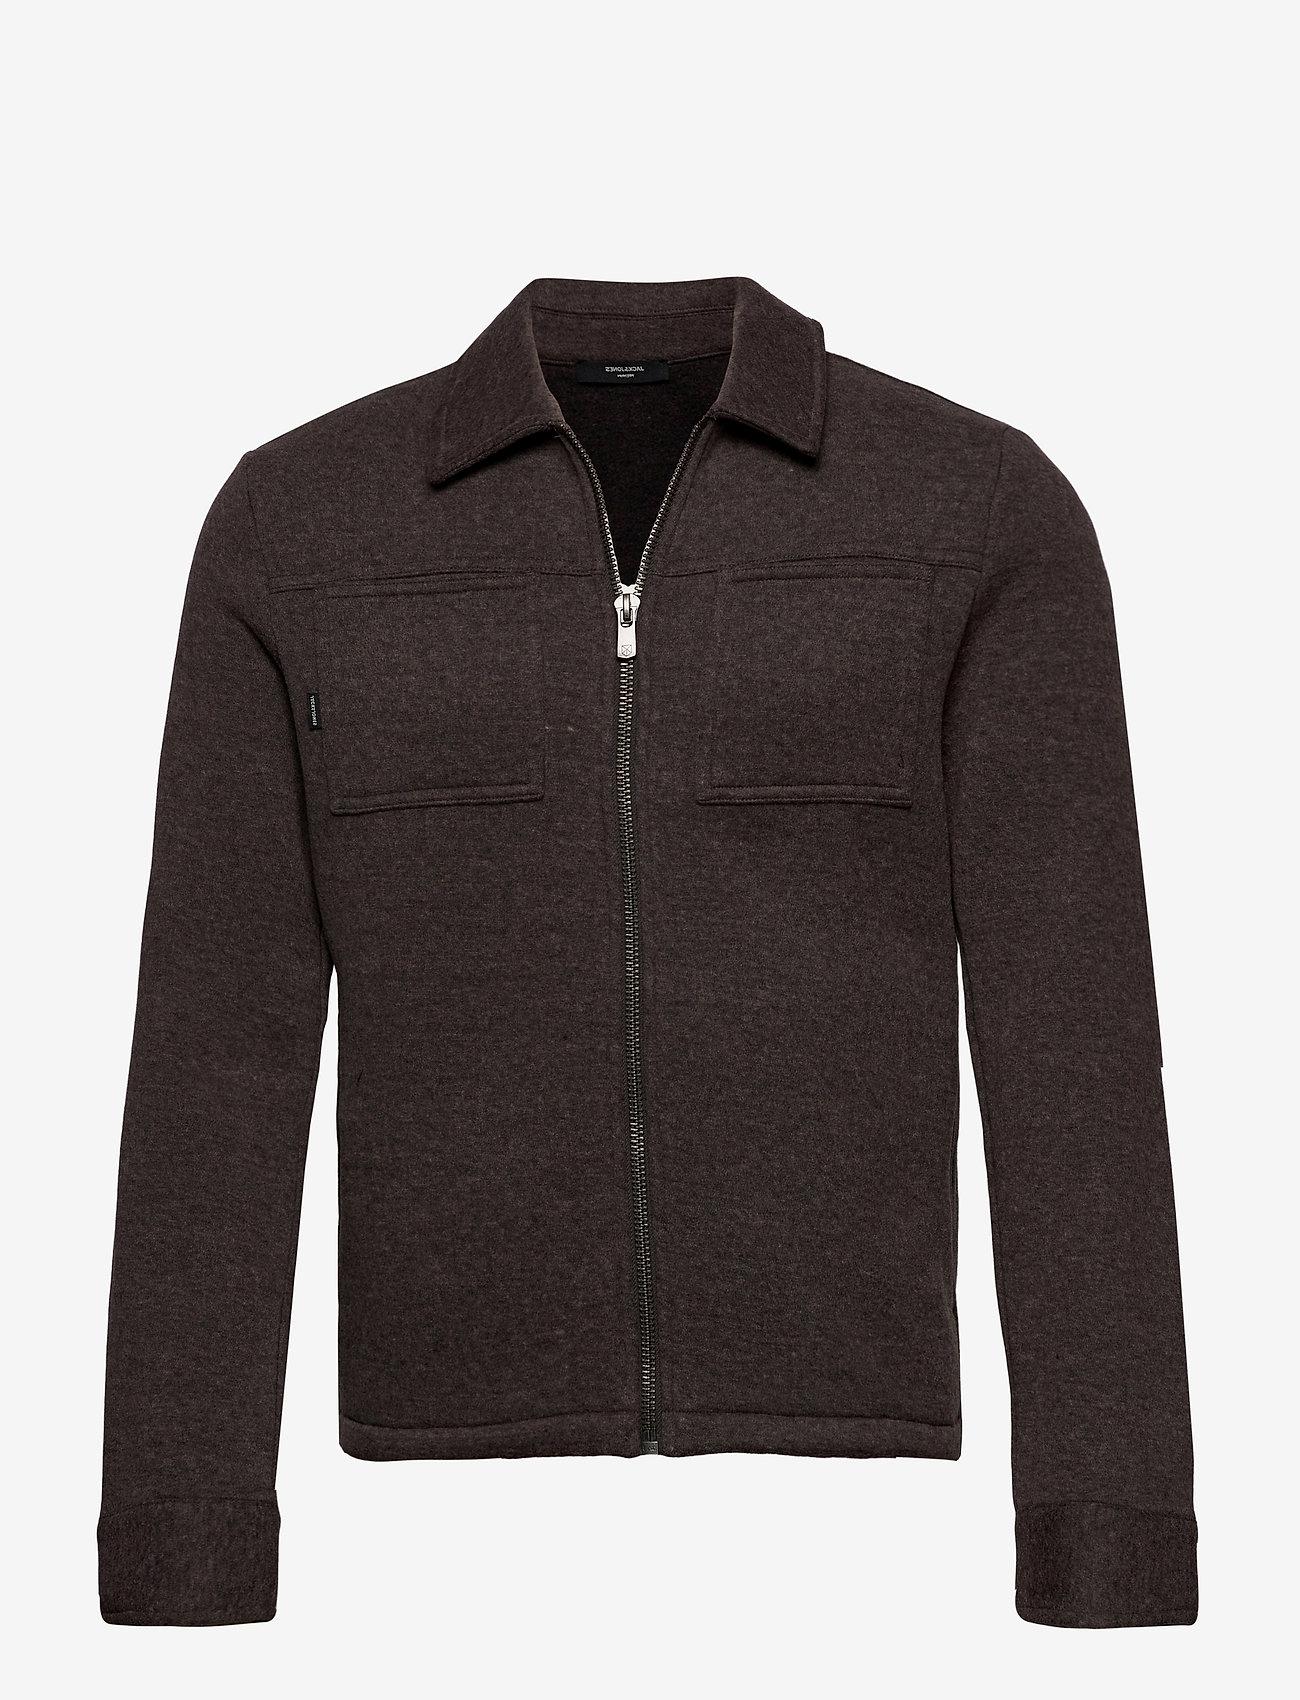 Jack & Jones - JPRBLADAWN SWEAT JACKET - basic sweatshirts - grey melange - 0